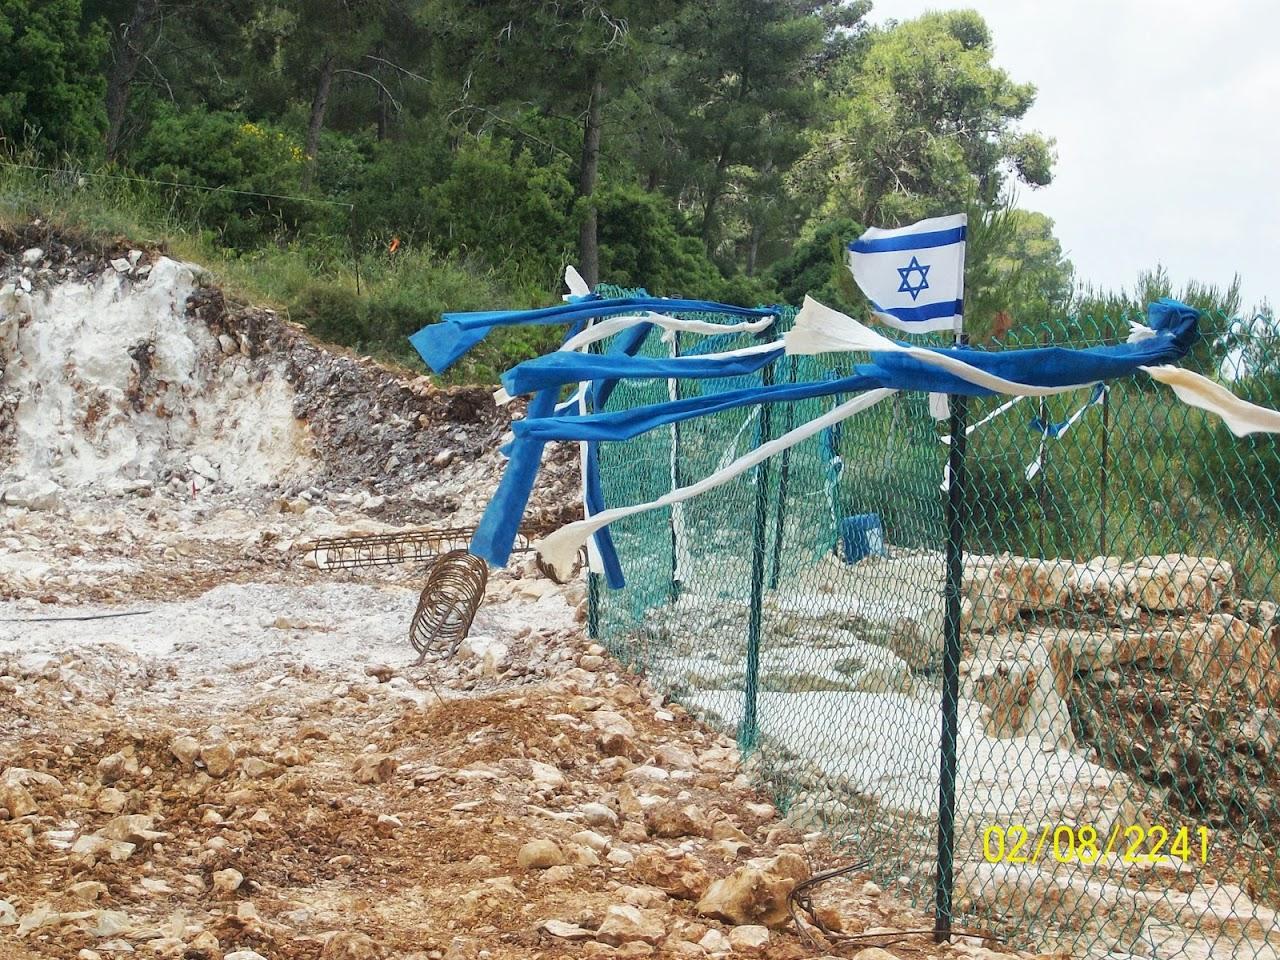 Synagogue Corner Stone  - 257010_1769541437945_4211415_o.jpg